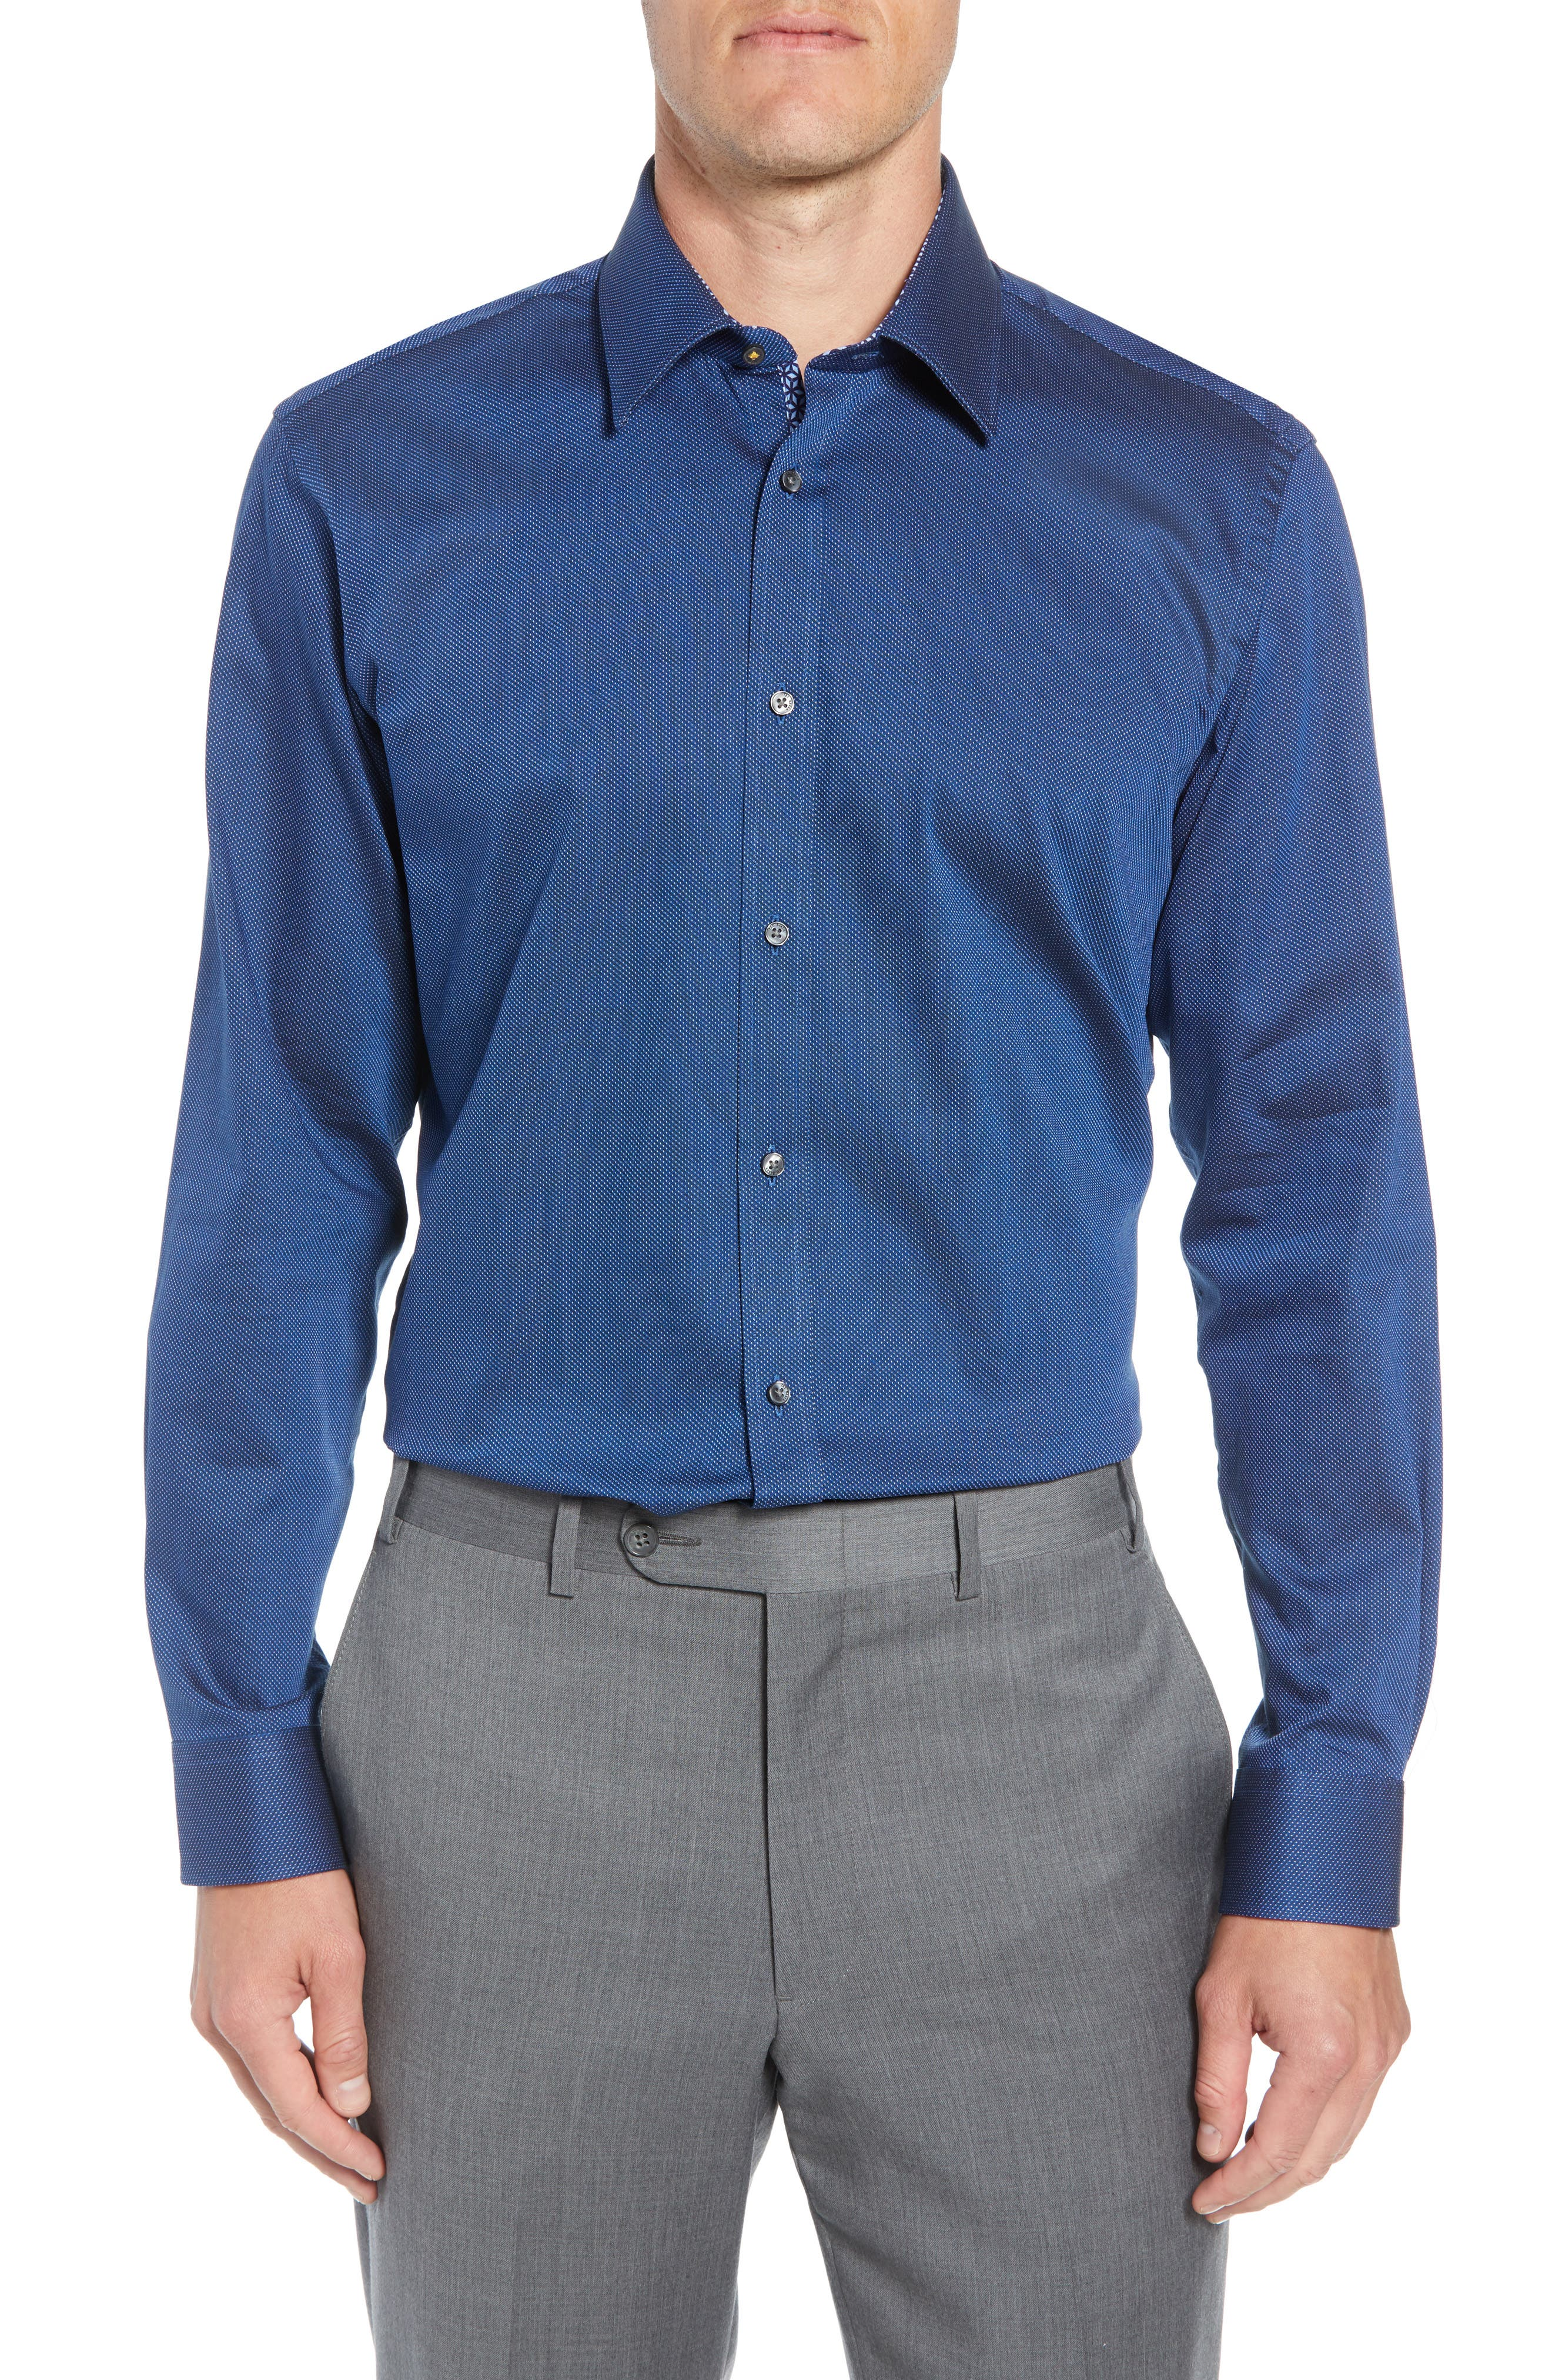 TED BAKER LONDON Wikks Slim Fit Print Dress Shirt, Main, color, 410